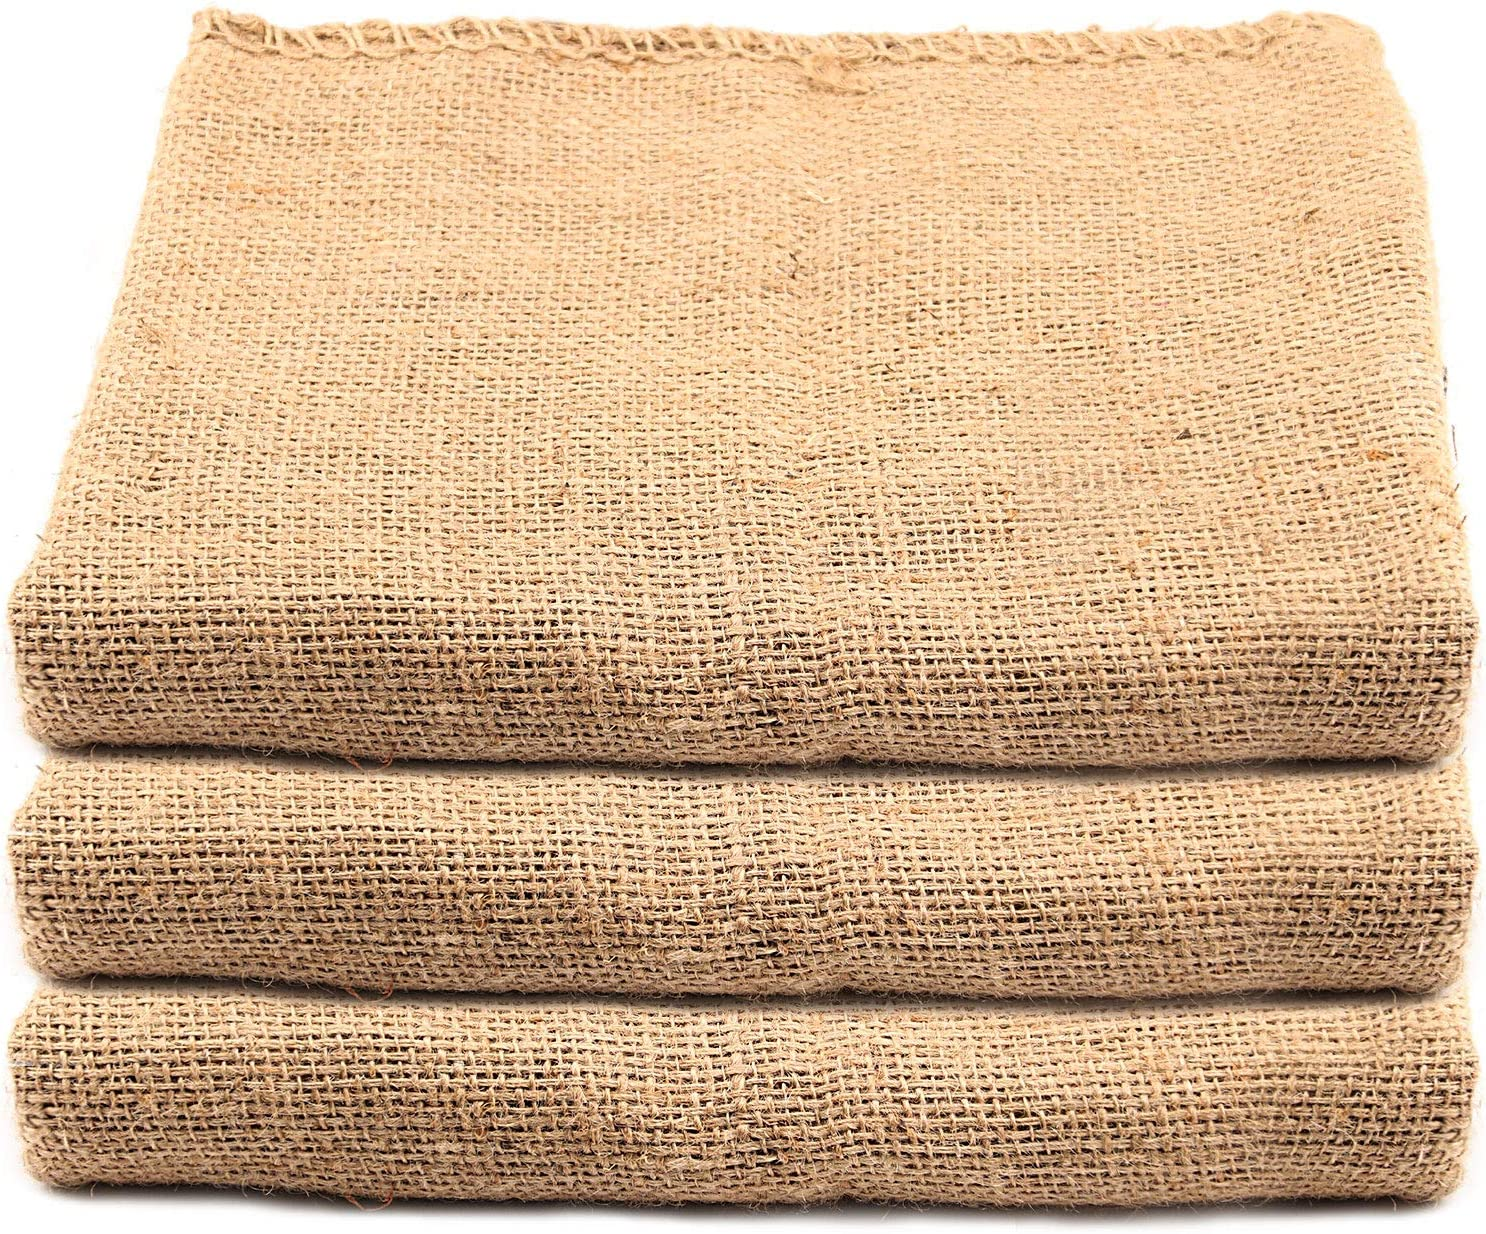 KEILEOHO 3 Pack 42 X 29 Inch Burlap Bags, Large Food Grade Burlap Sacks for Gardening, Planting Growing Bags, Potato Sack Race Bags for School Racing Game, Christmas Party Game…